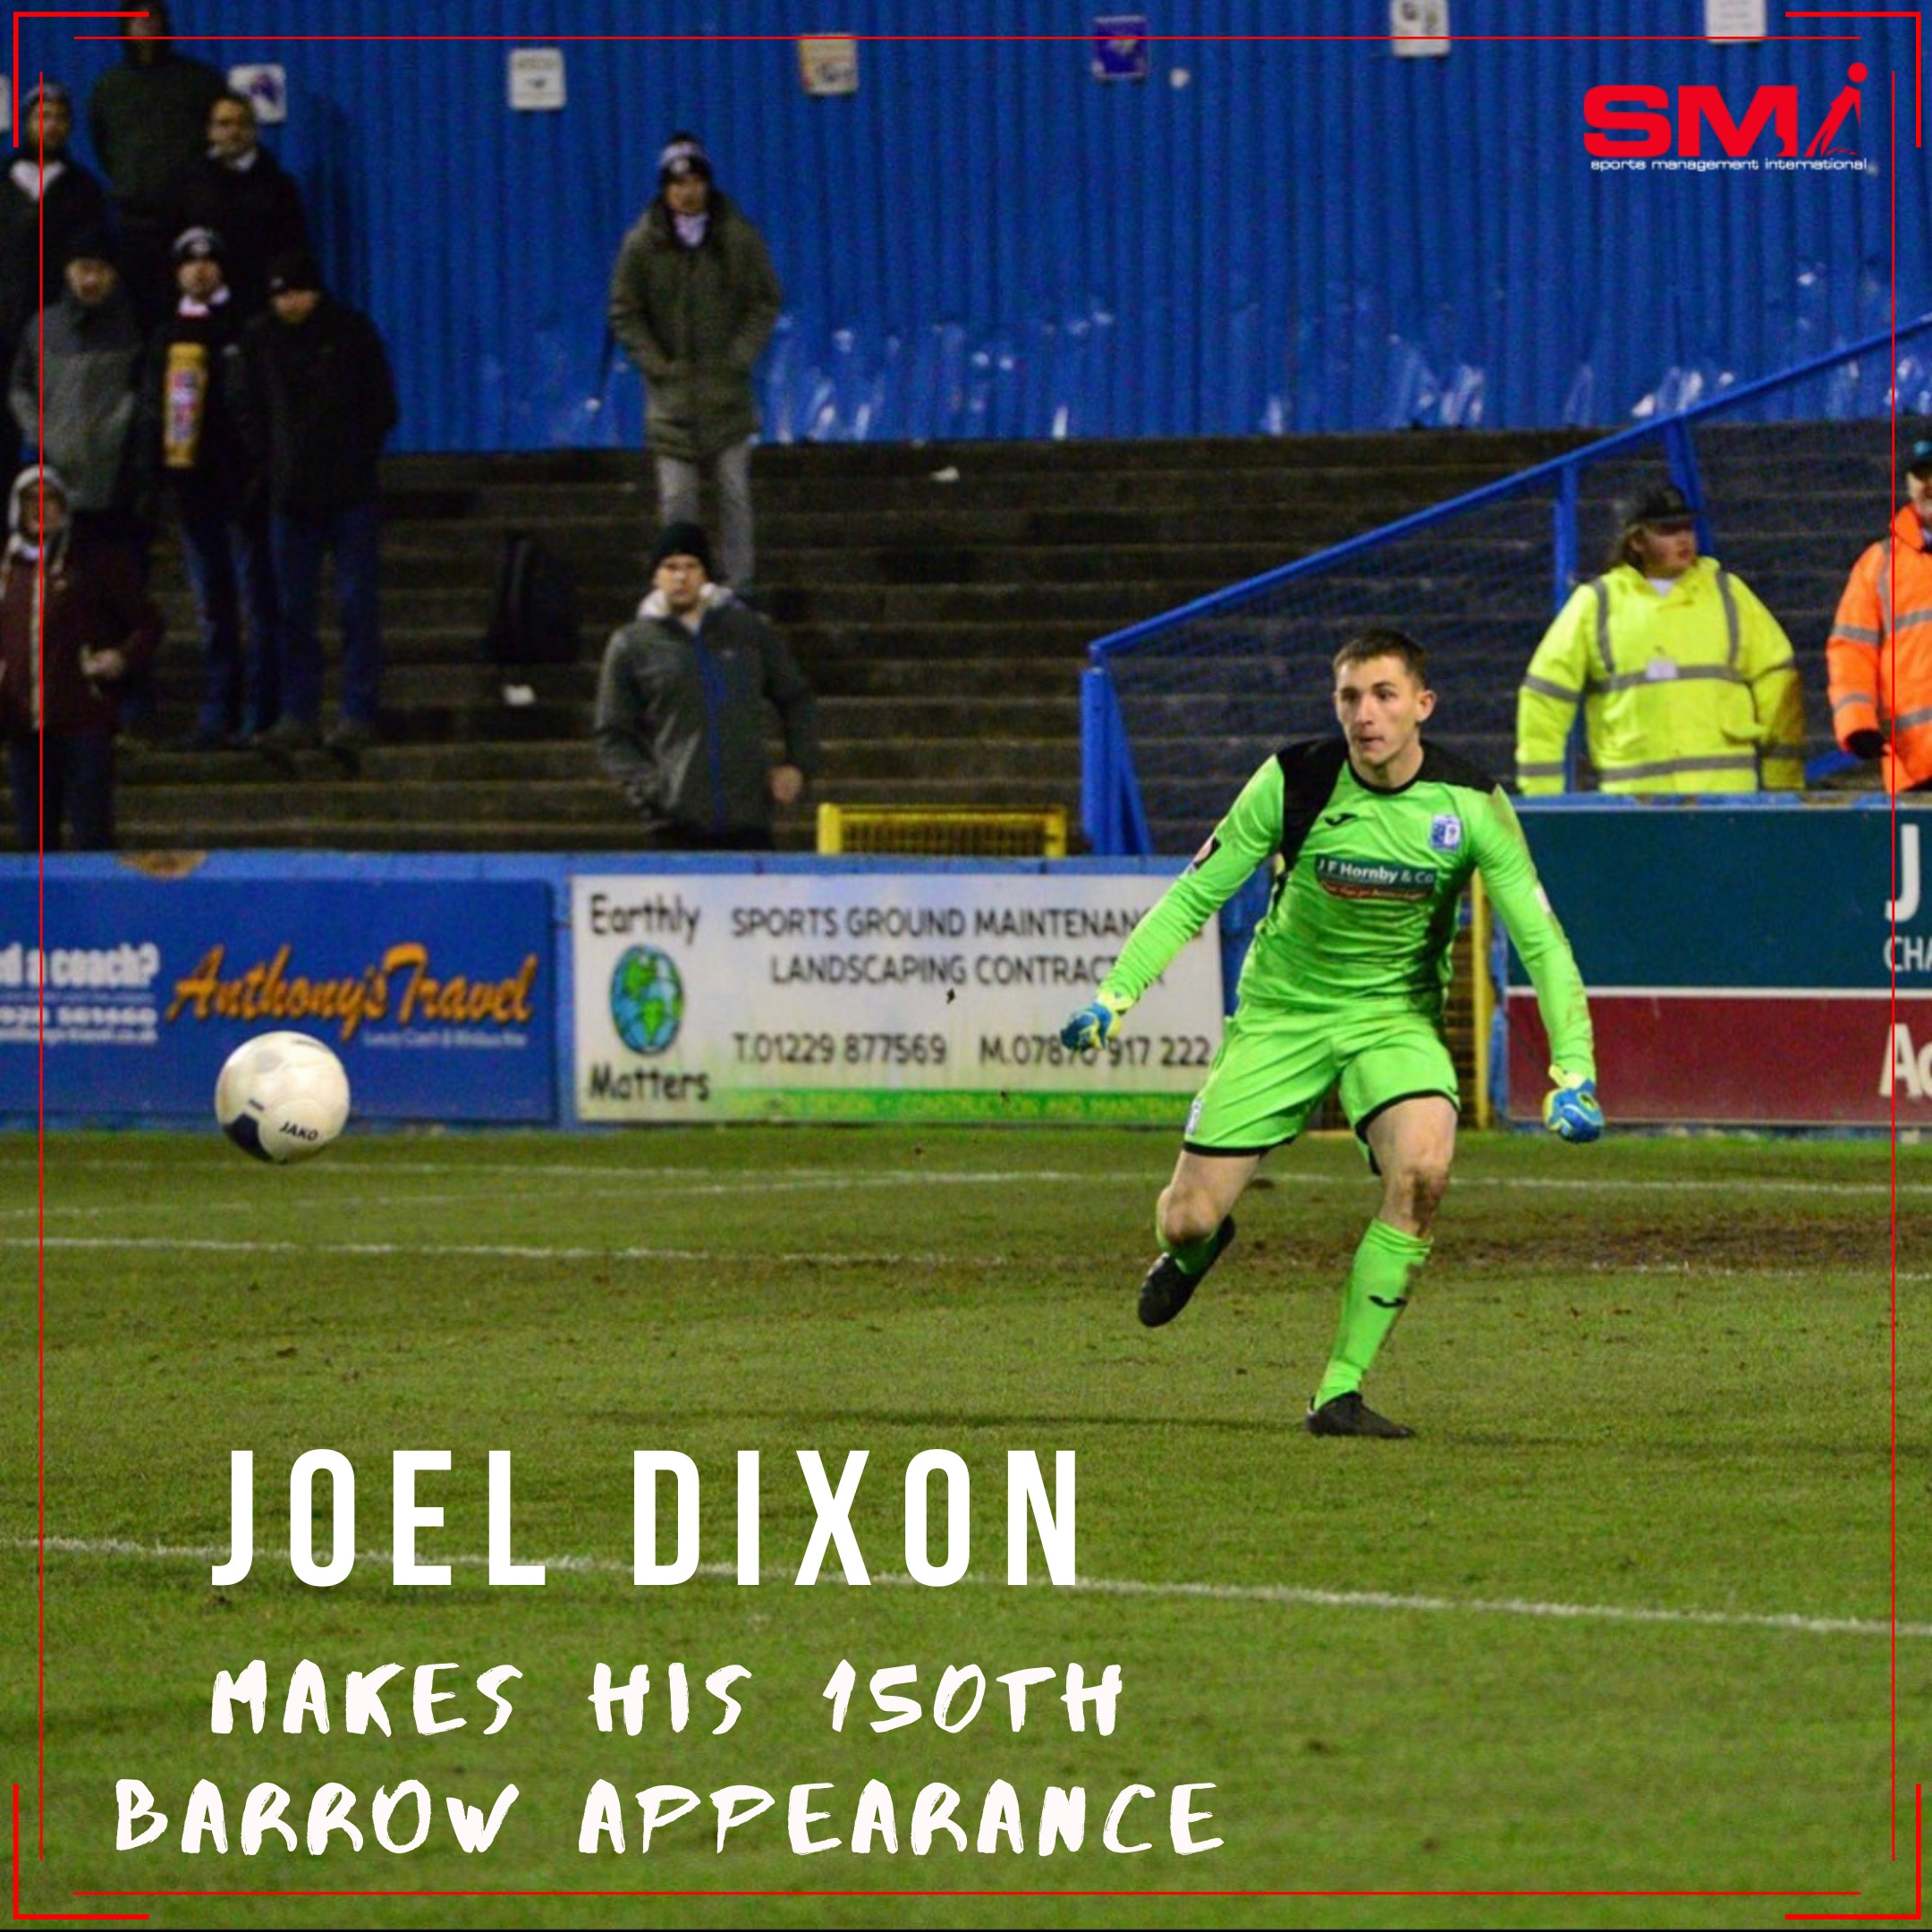 Joel Dixon milestone